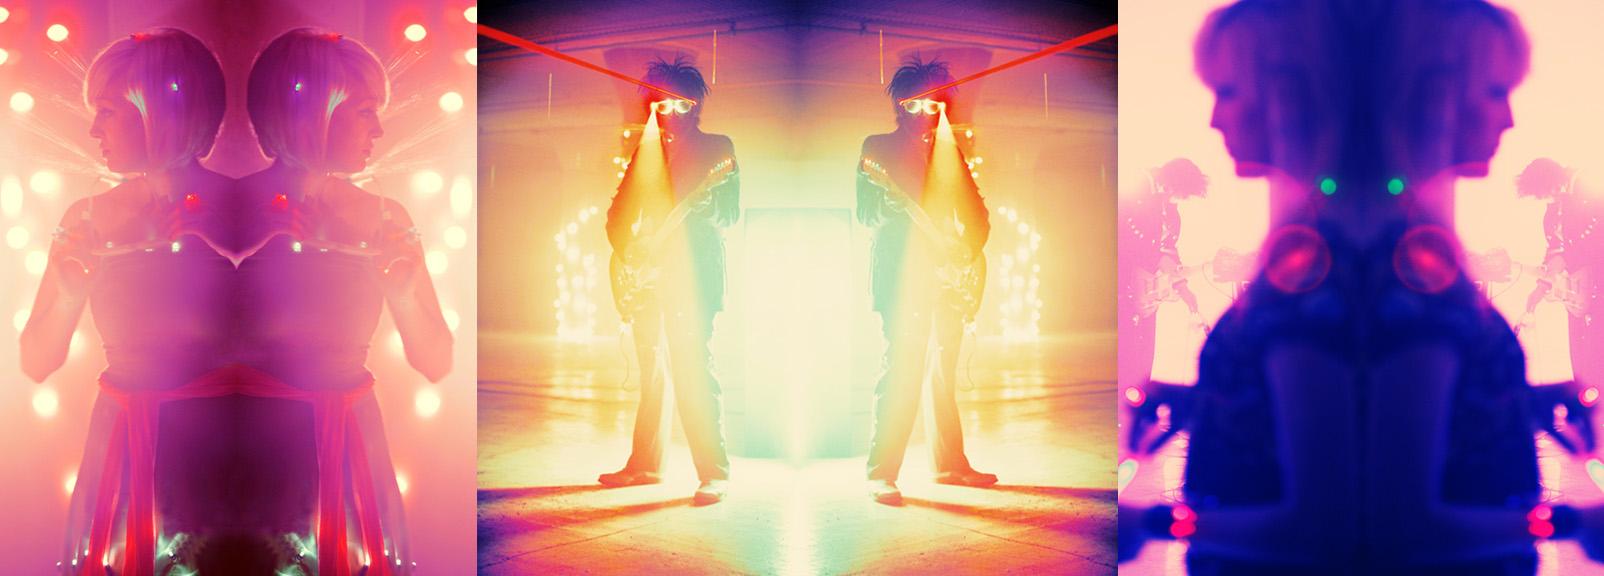 Farewell Continental Music Video & Photography Session - Dir. Shane Nelson - Prod.  Ben Katz  - DP  T.J. Schwingle                                            (Photos:  Clark Patrick )